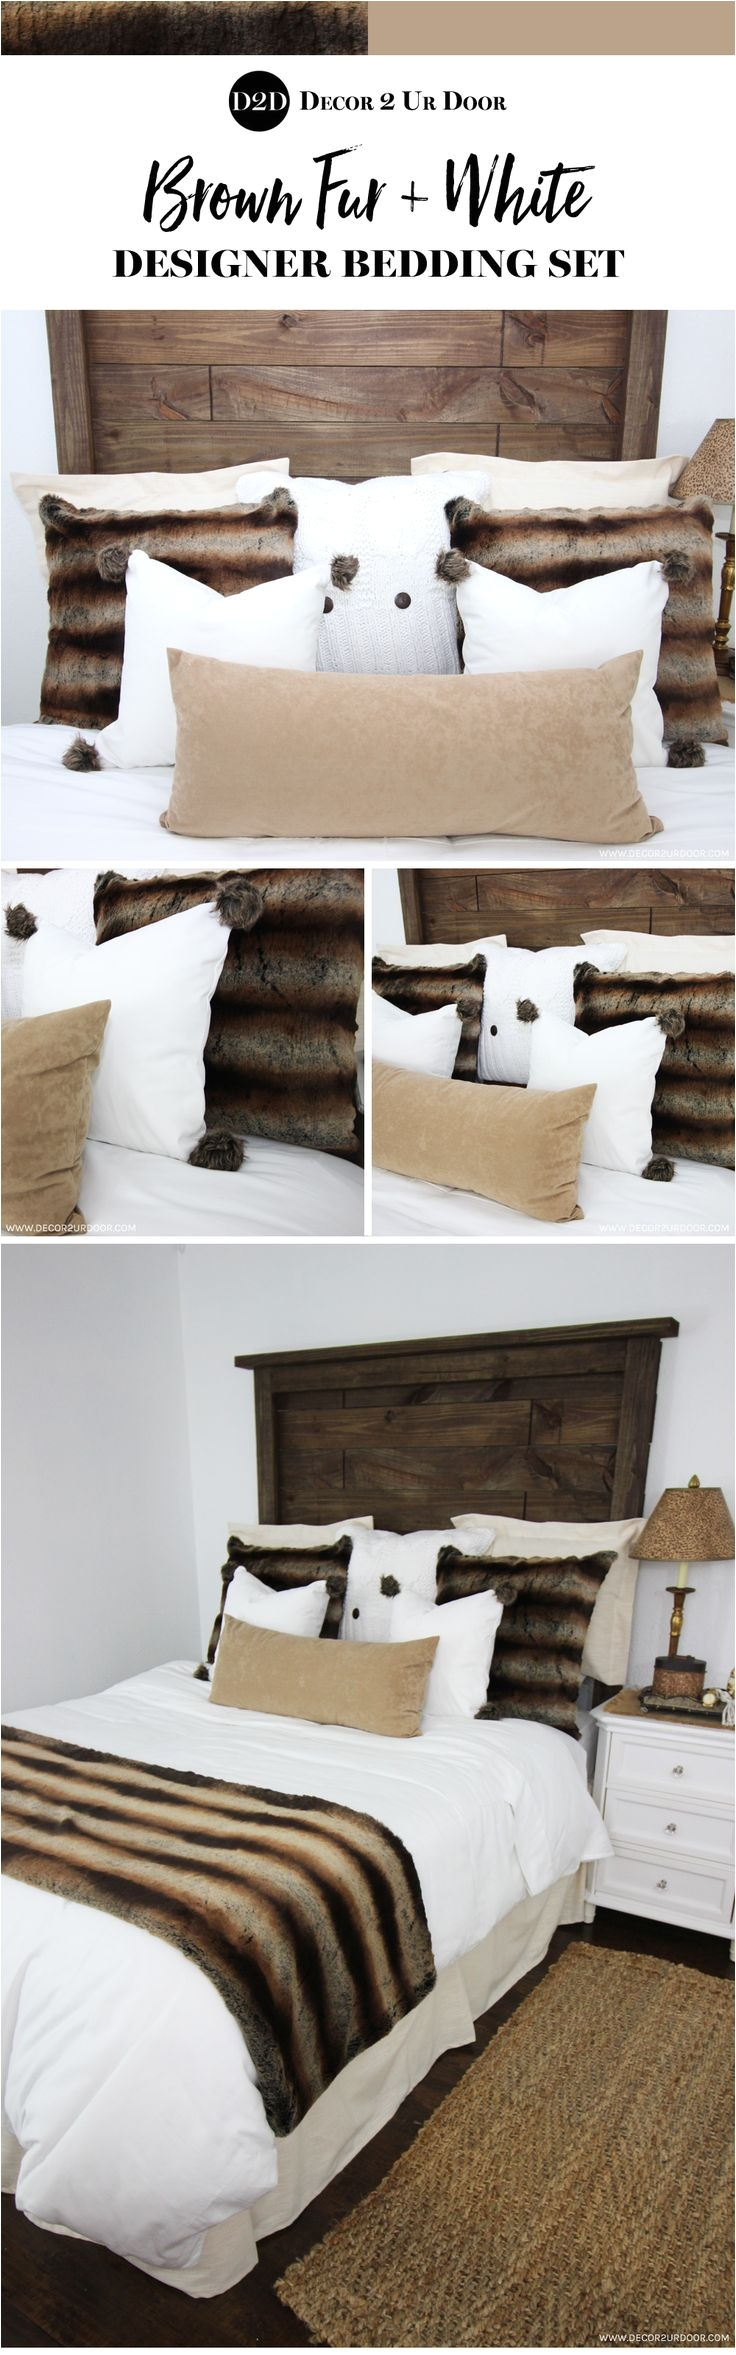 brown fur white custom designer bedding collection